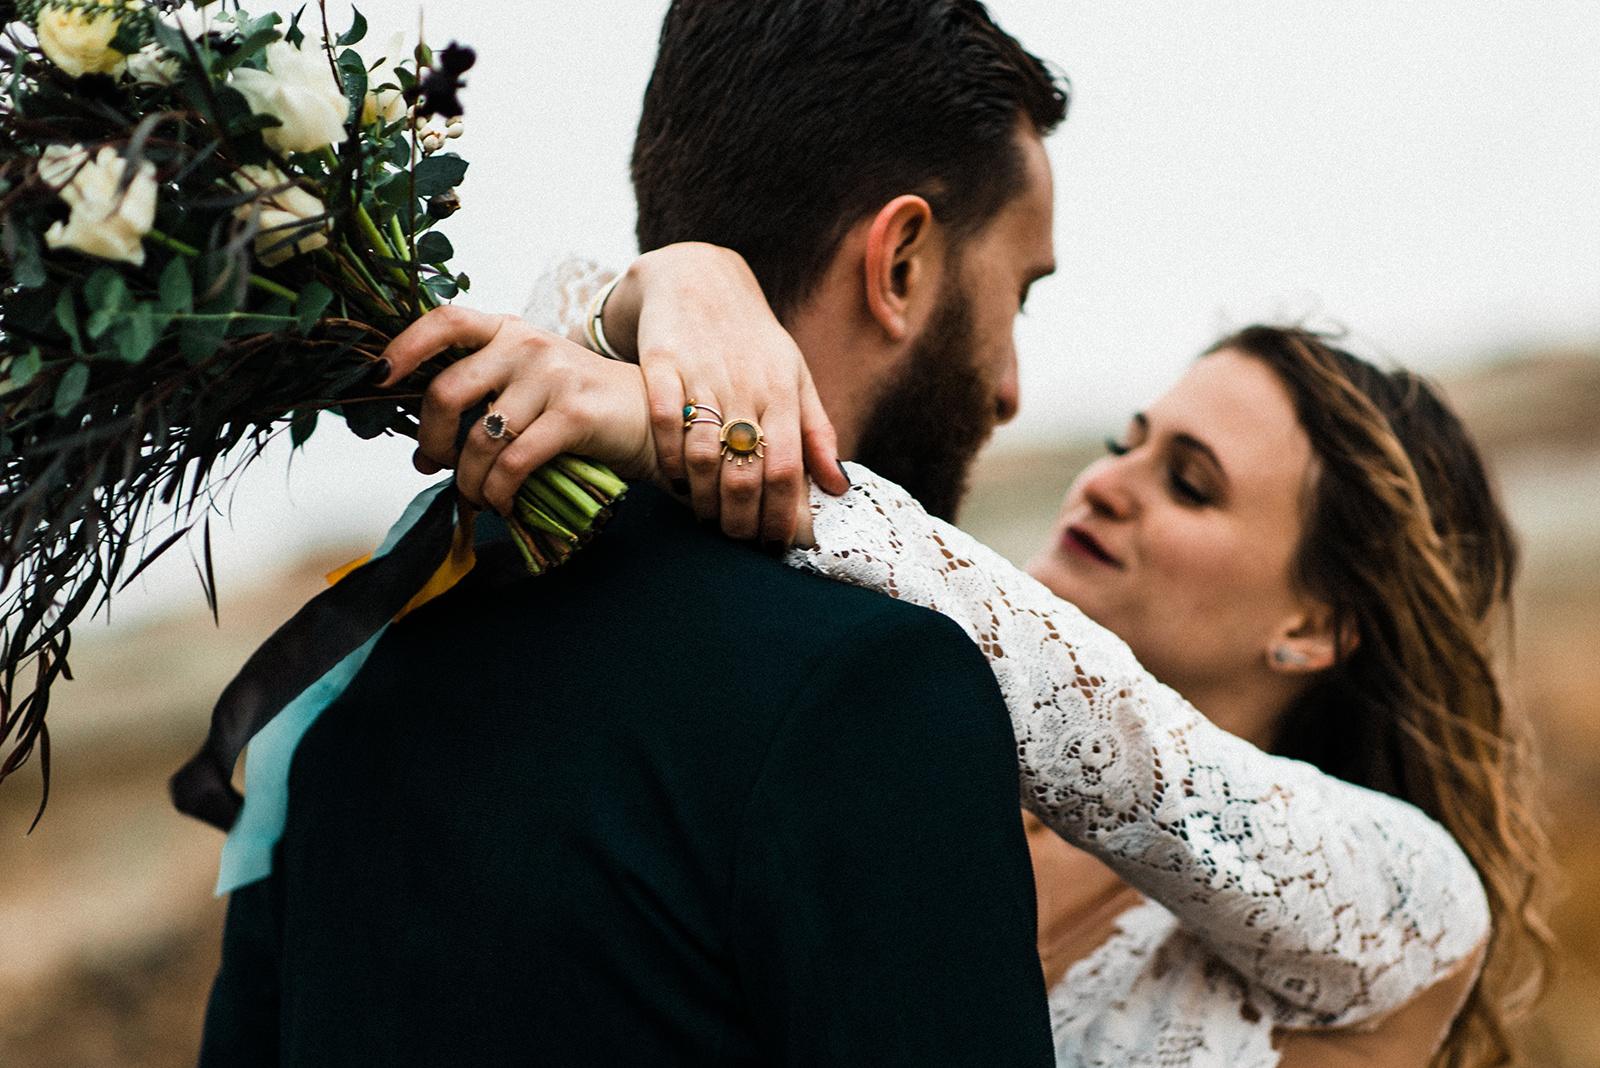 Oregon_Coast_Elopement_Wedding_The_Foxes_Photography_113.jpg